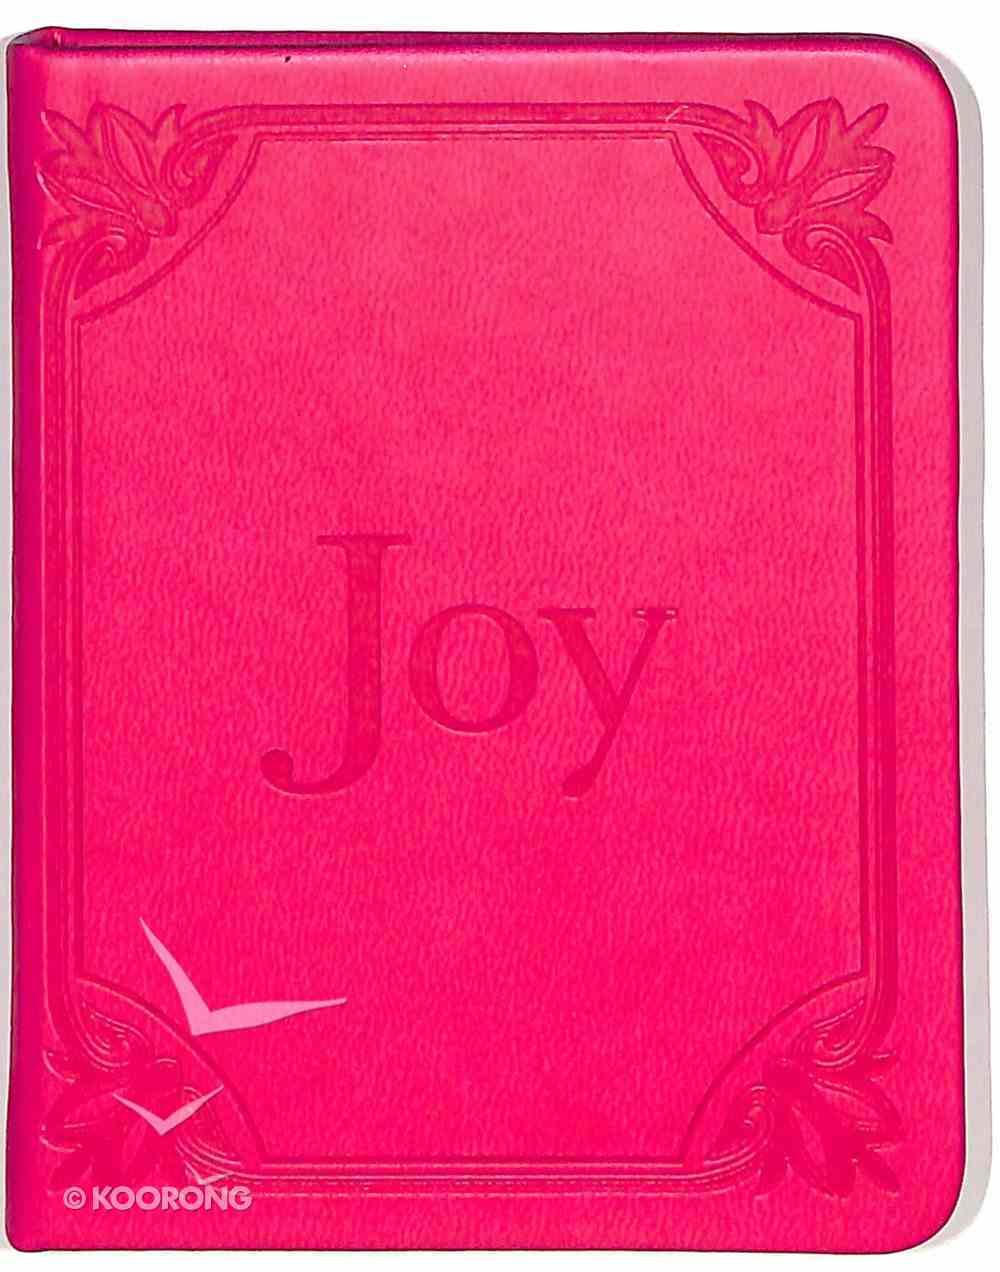 Joy (Bright Pink) (Pocket Inspirations Series) Imitation Leather